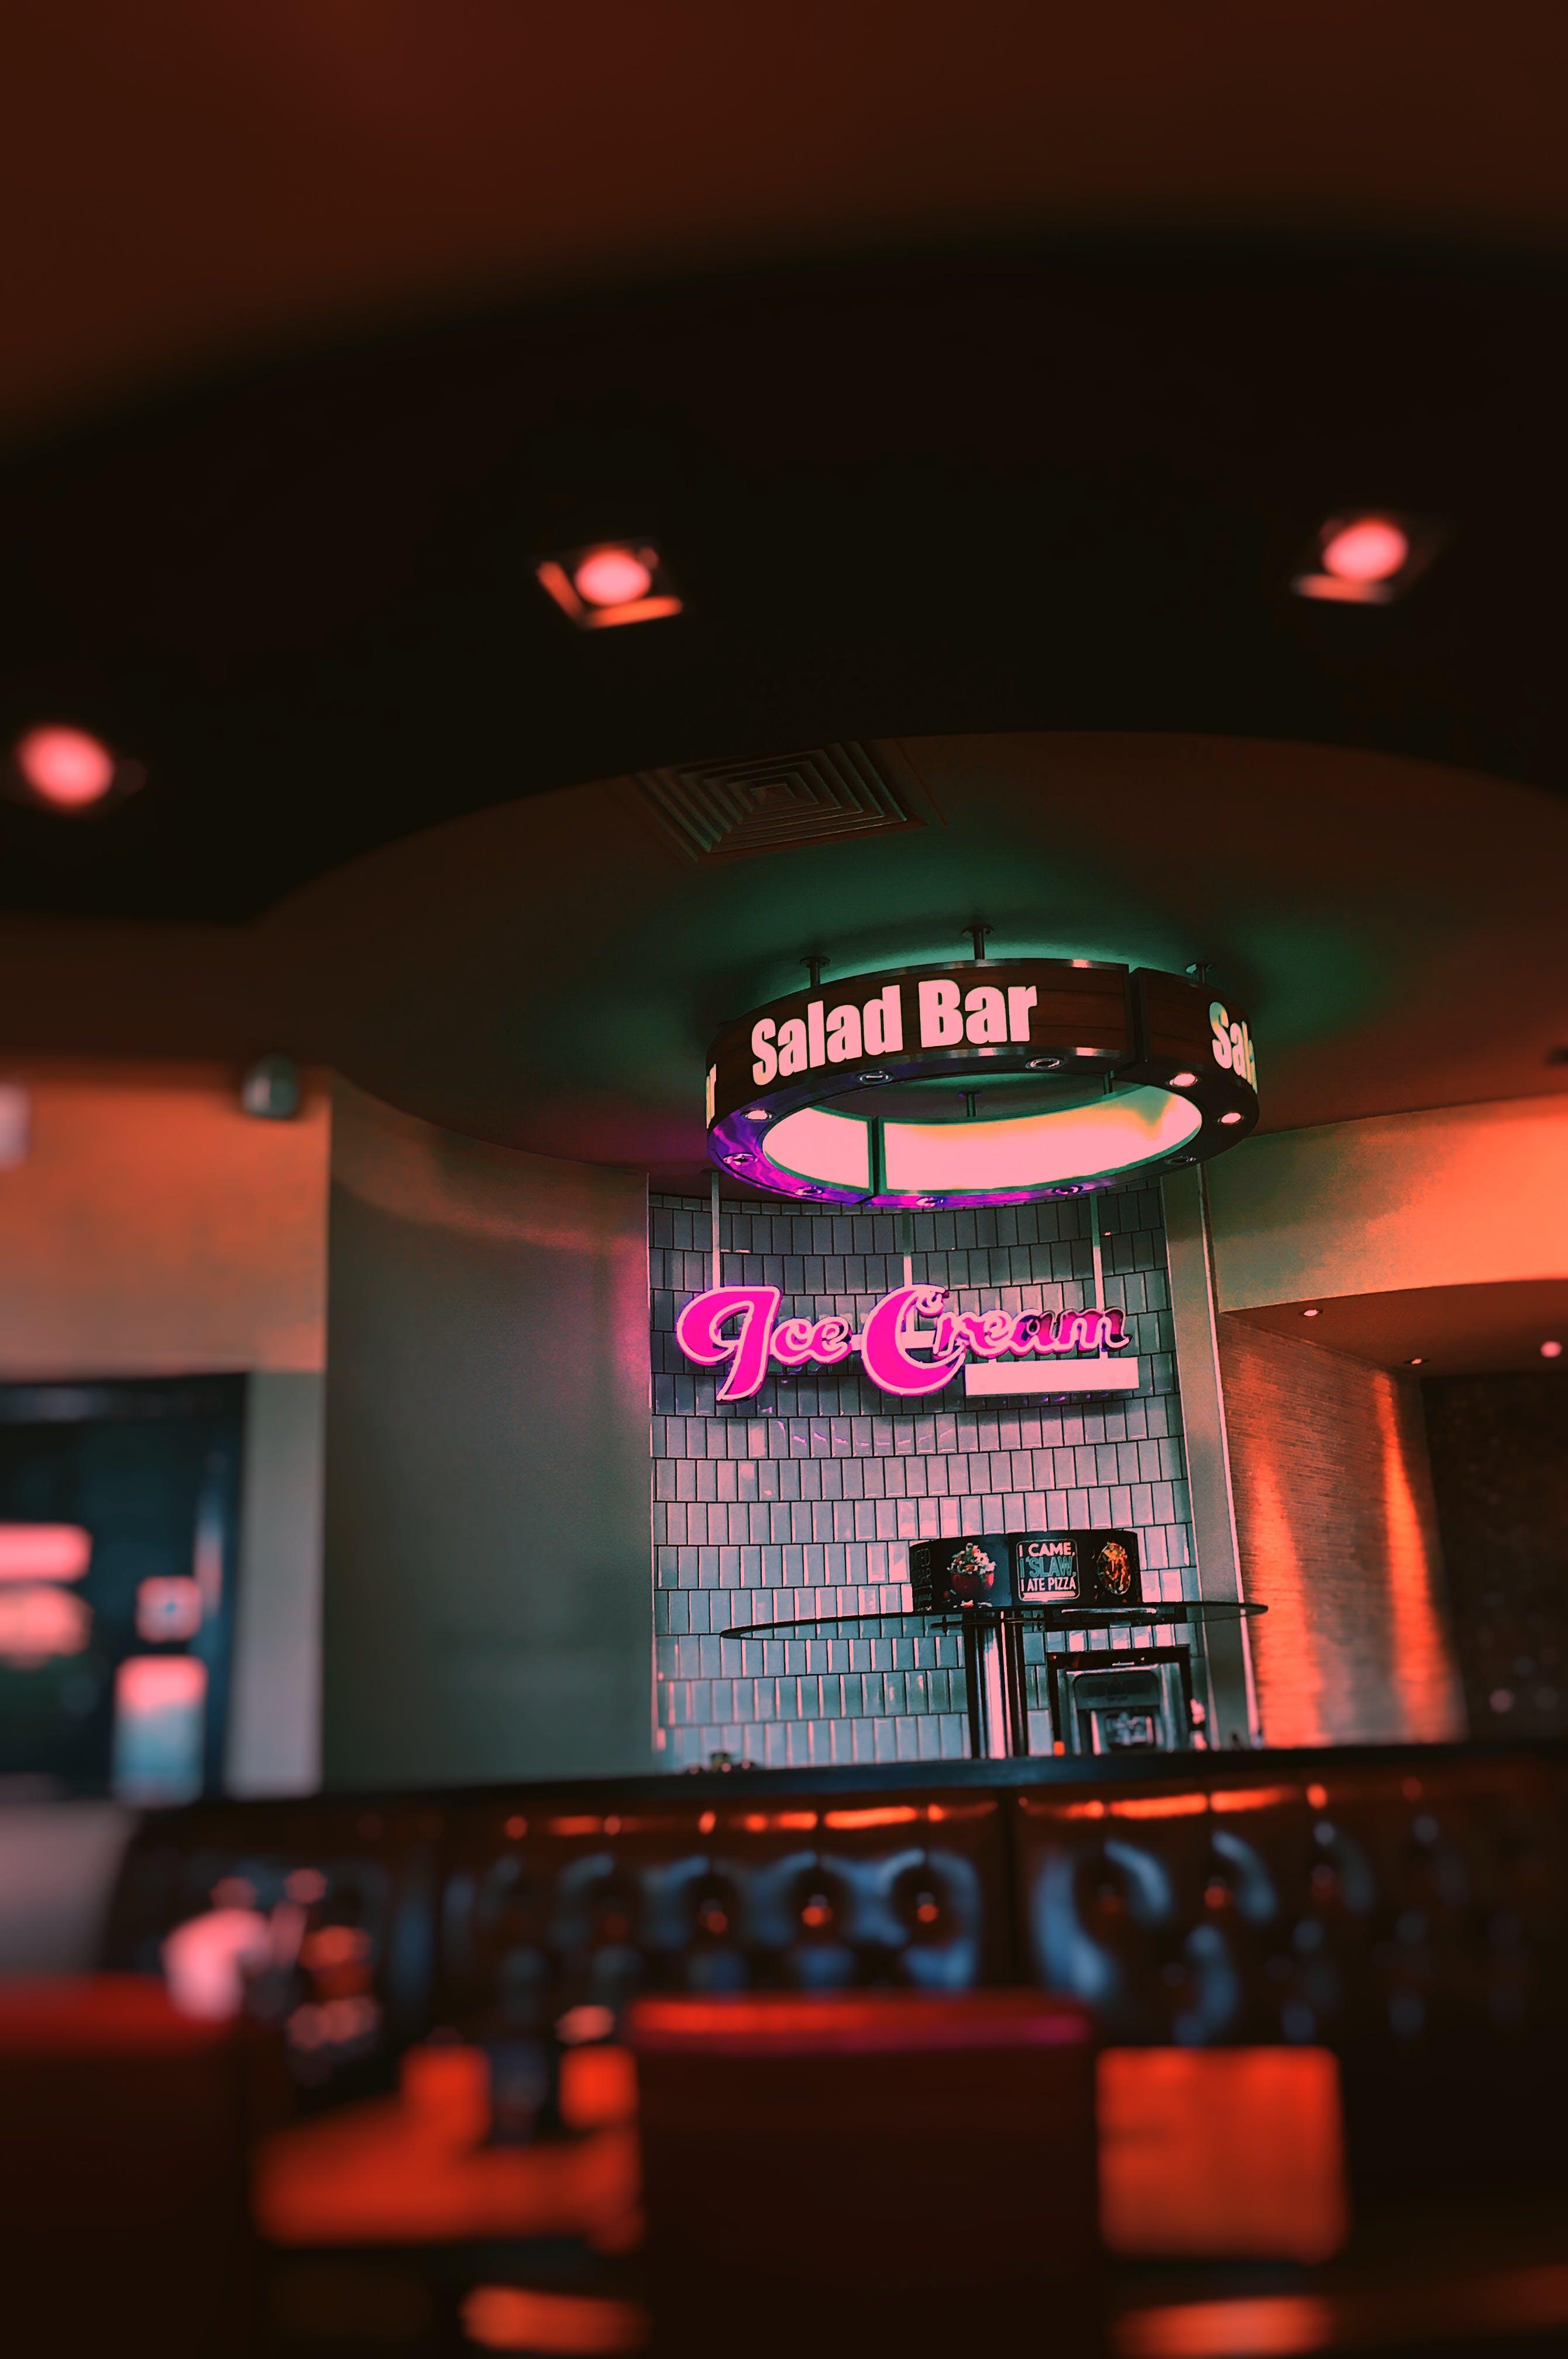 Ice Cream Neon Light Signage